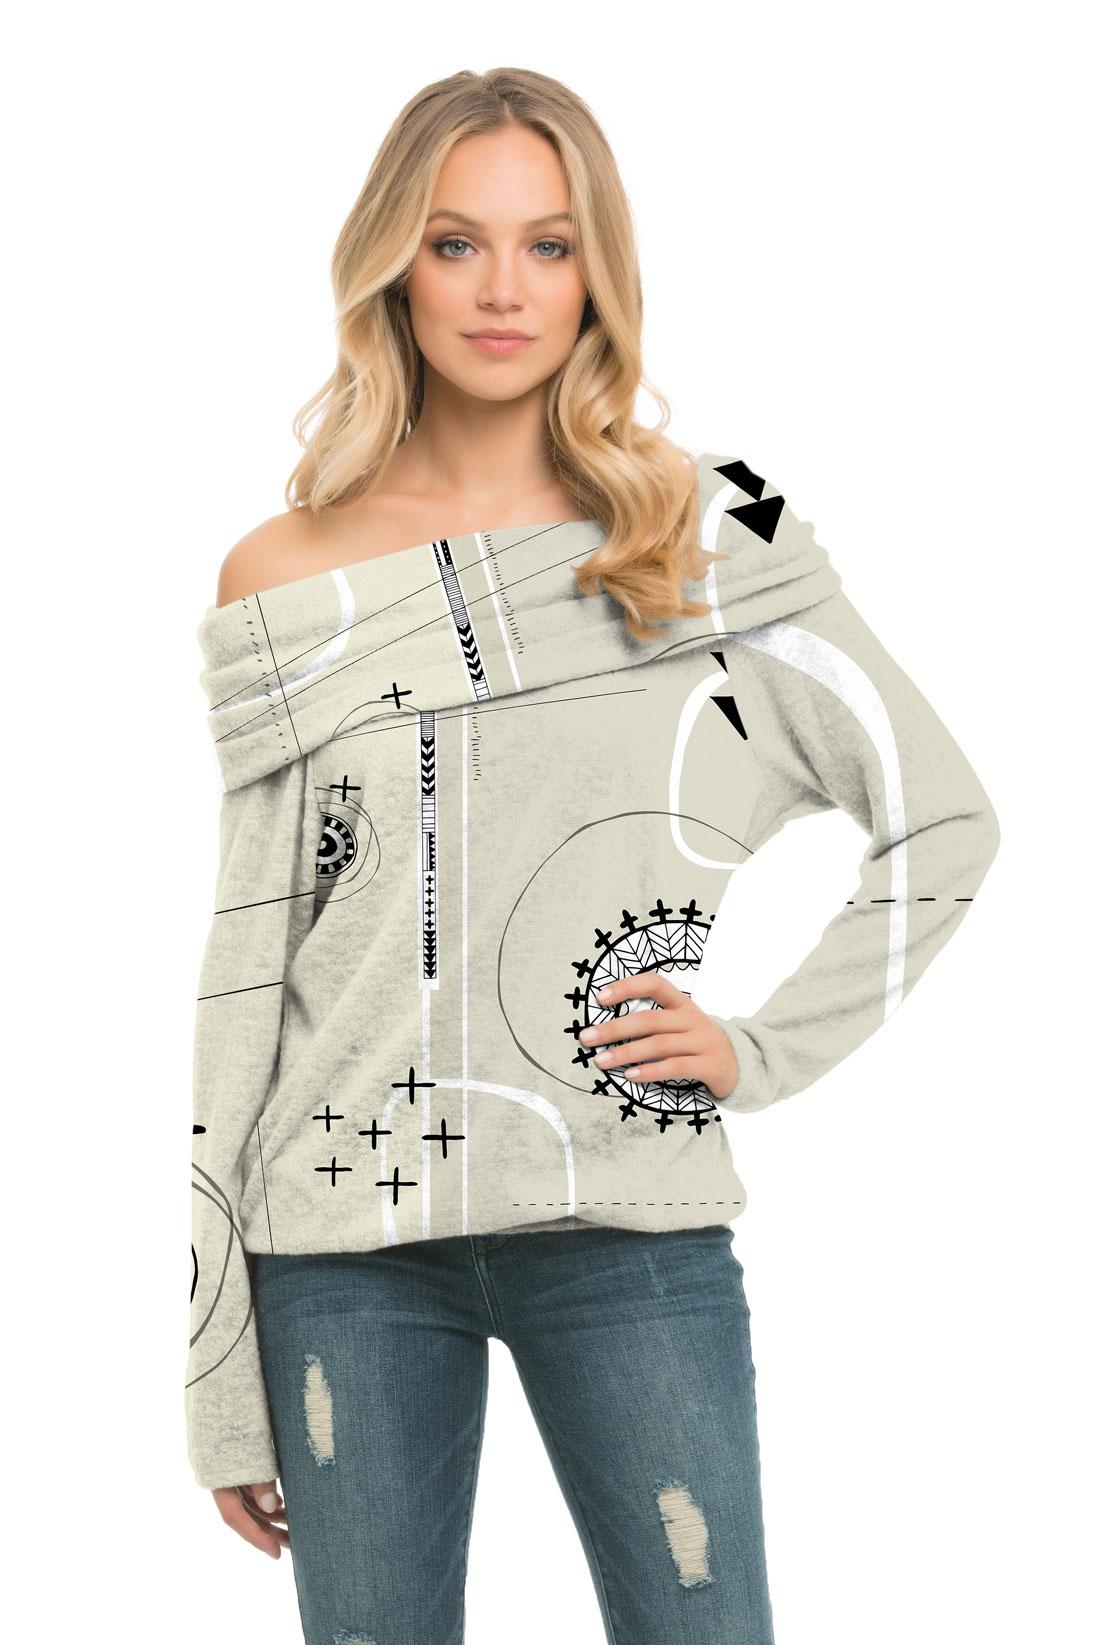 FF-geos-pullover-top-mock-up-MAIN-Pattern.jpg